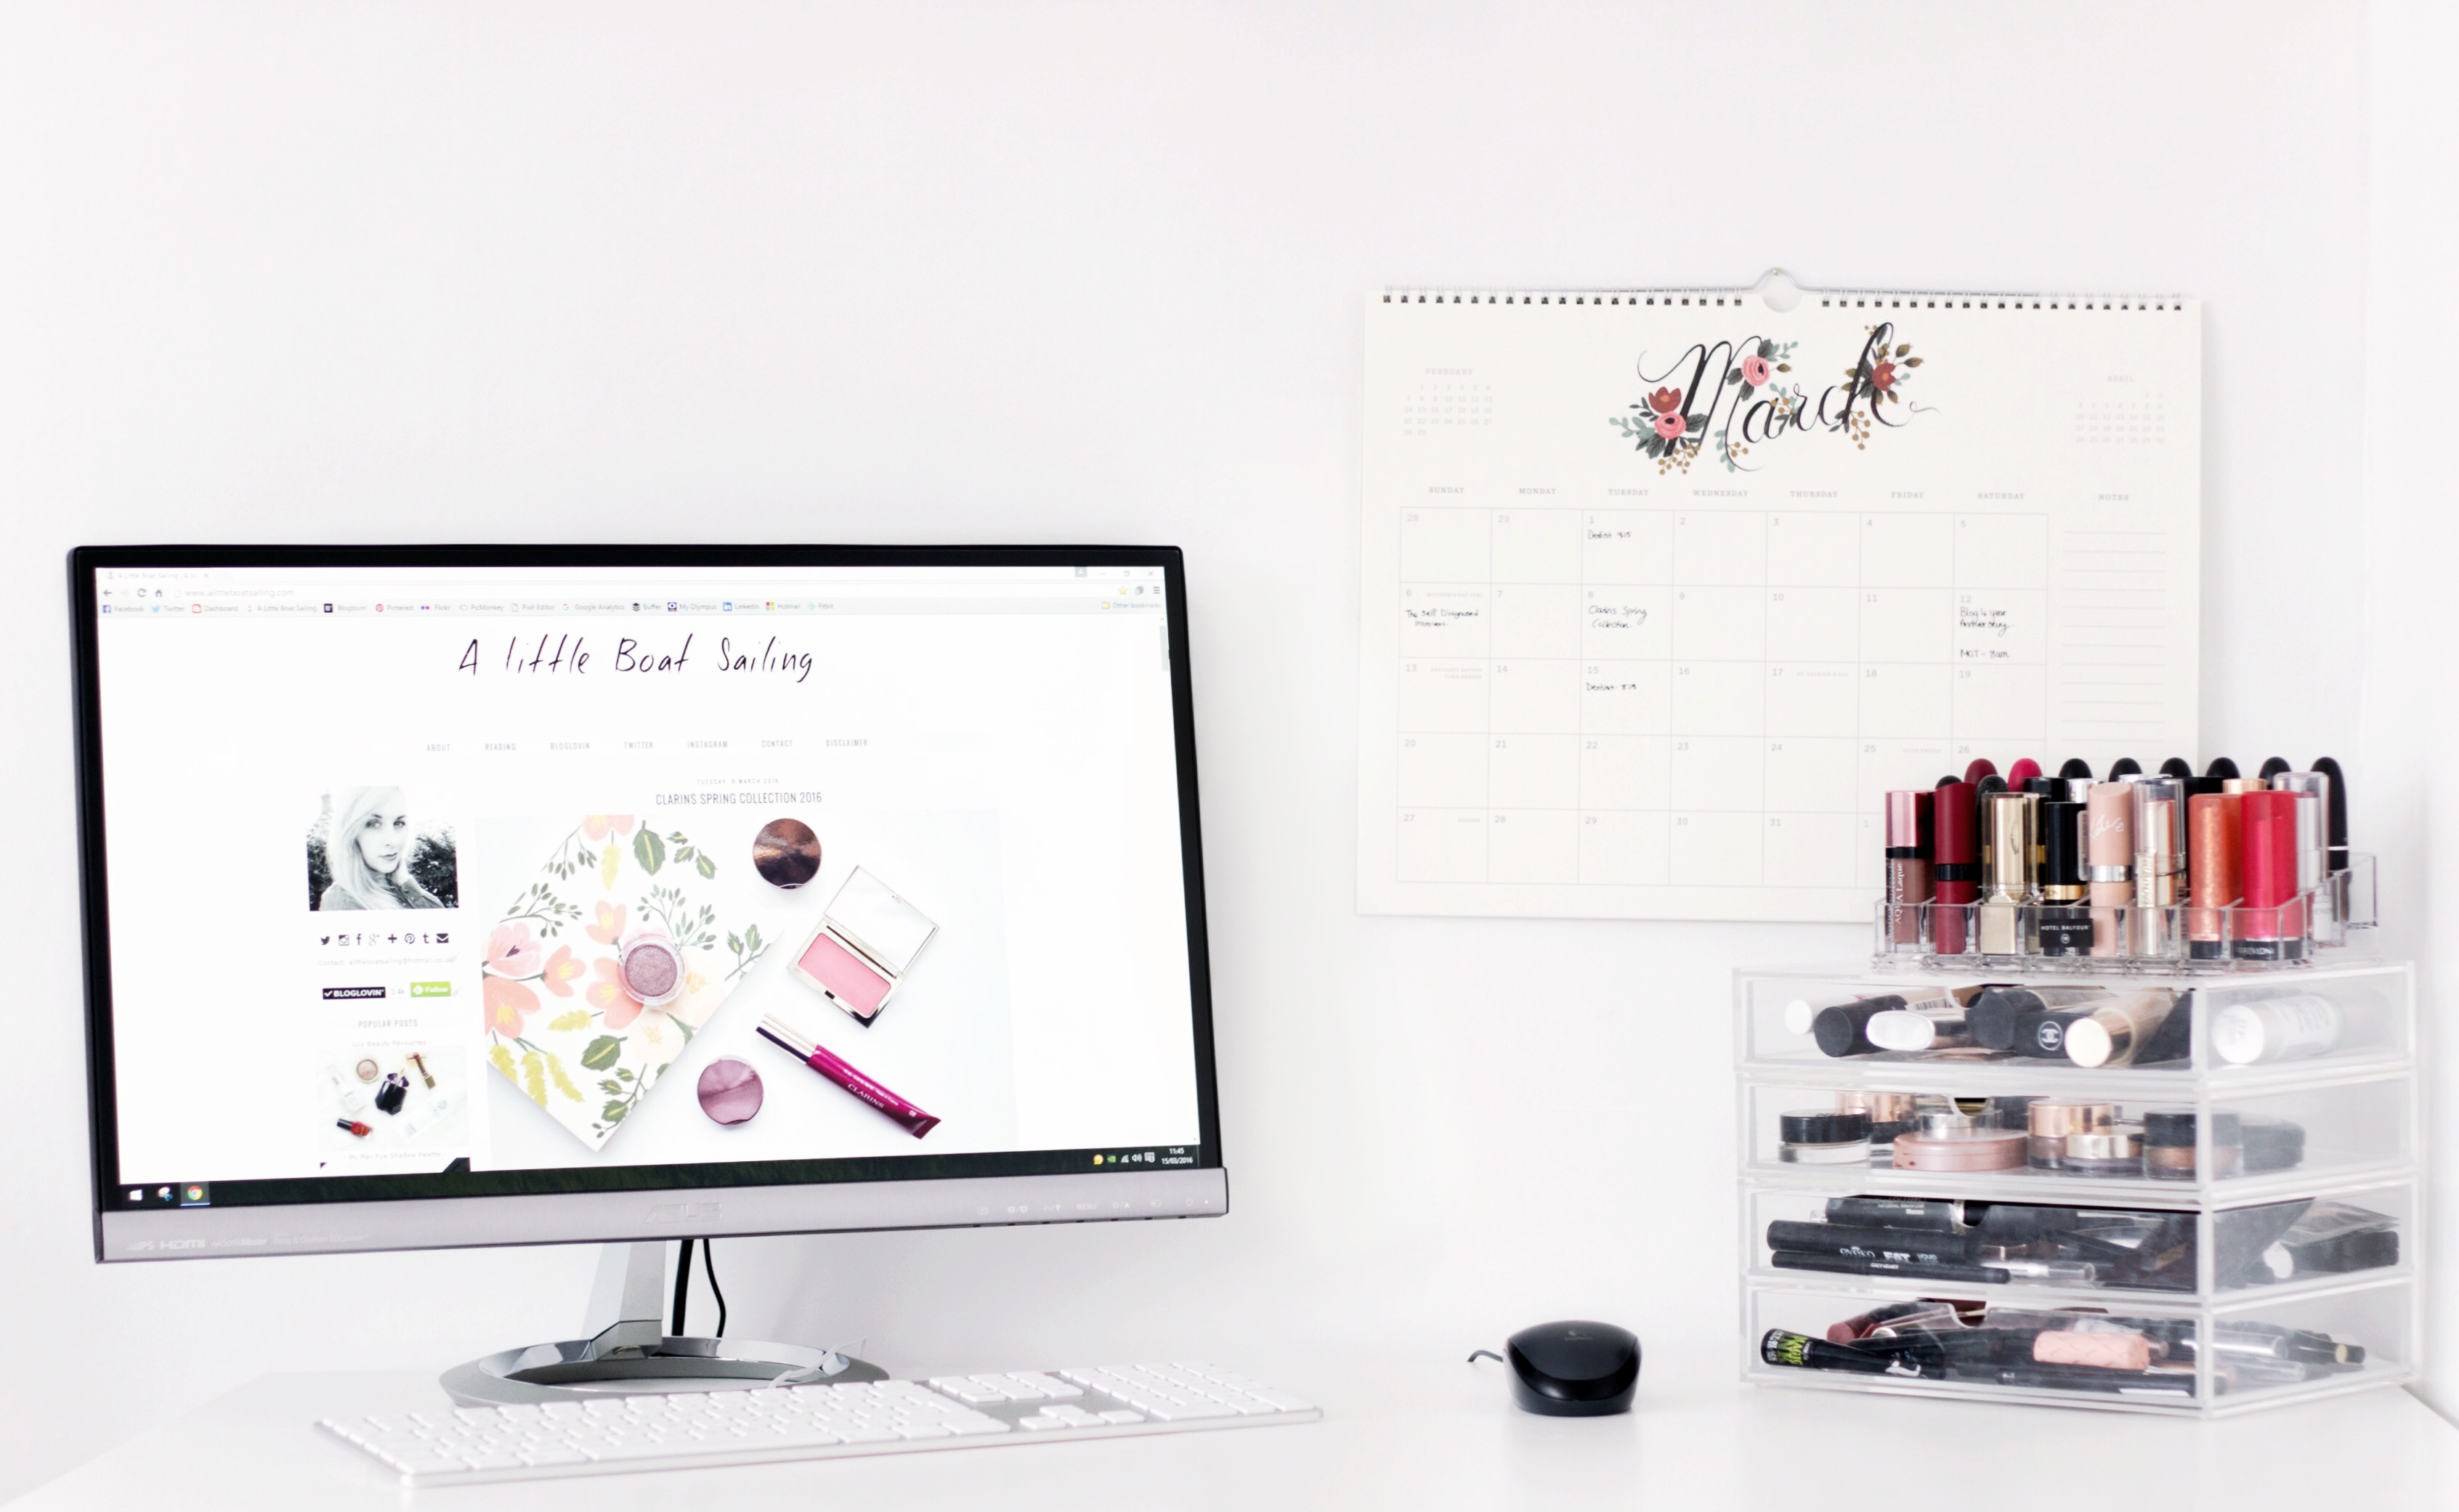 4-years-blogging